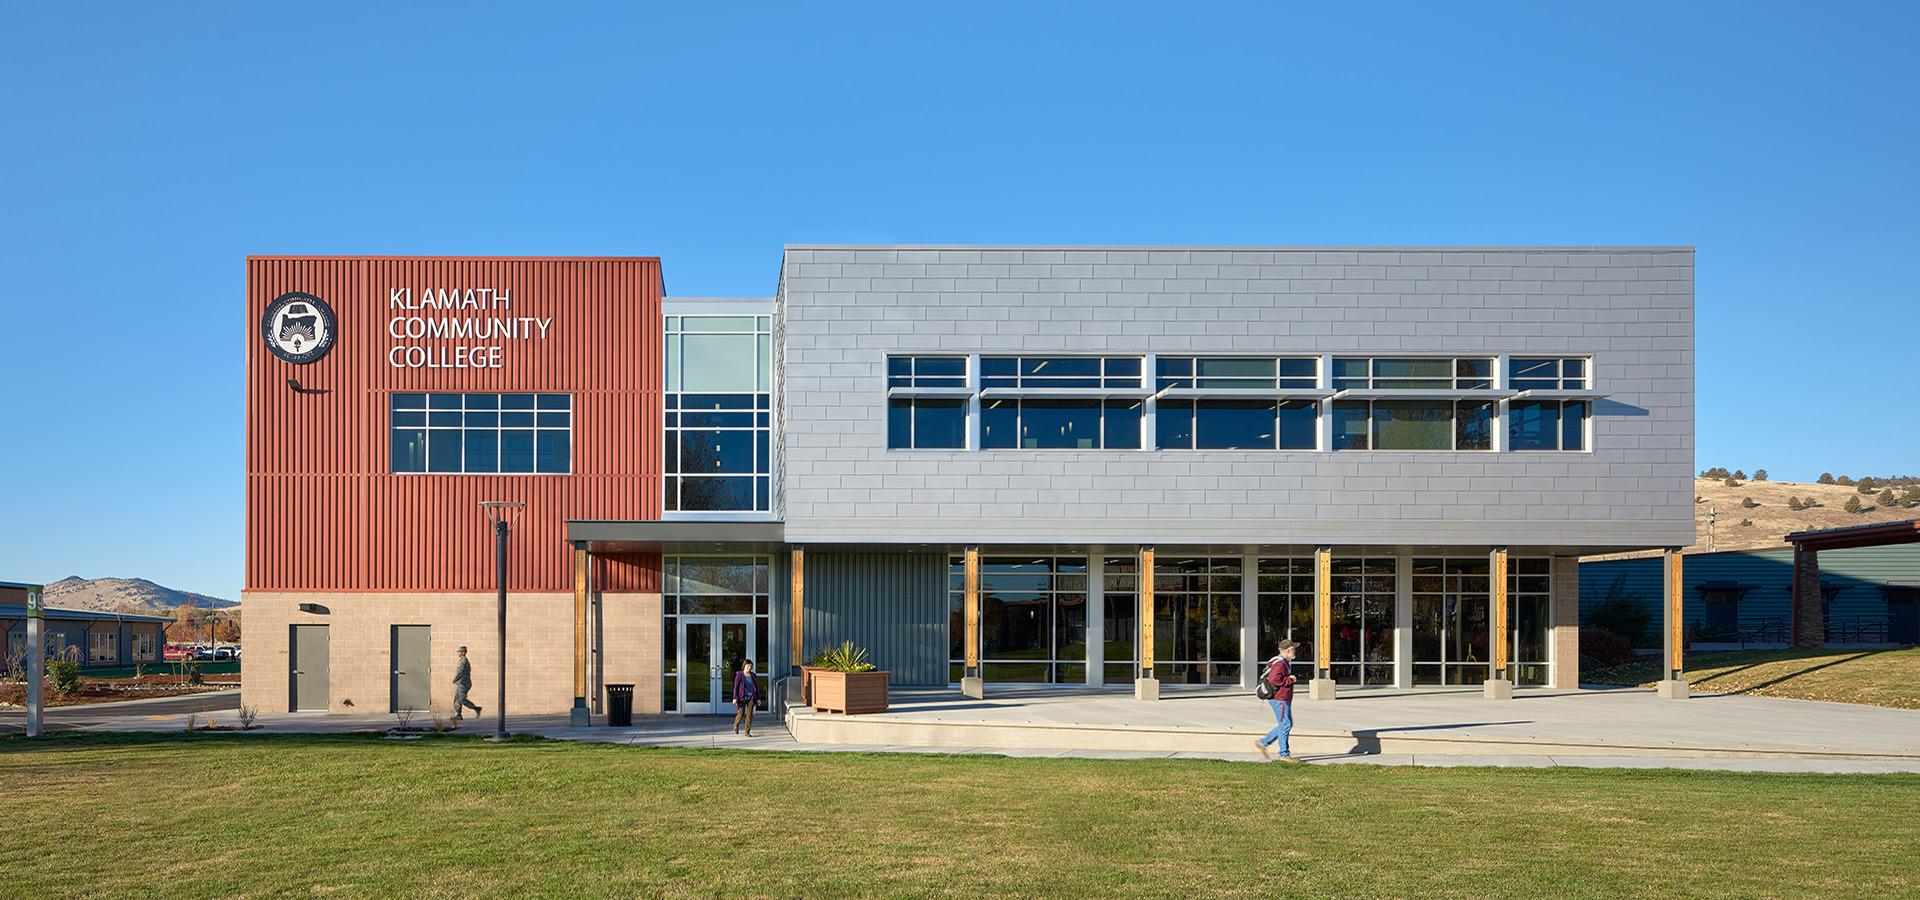 Klamath Community College exterior